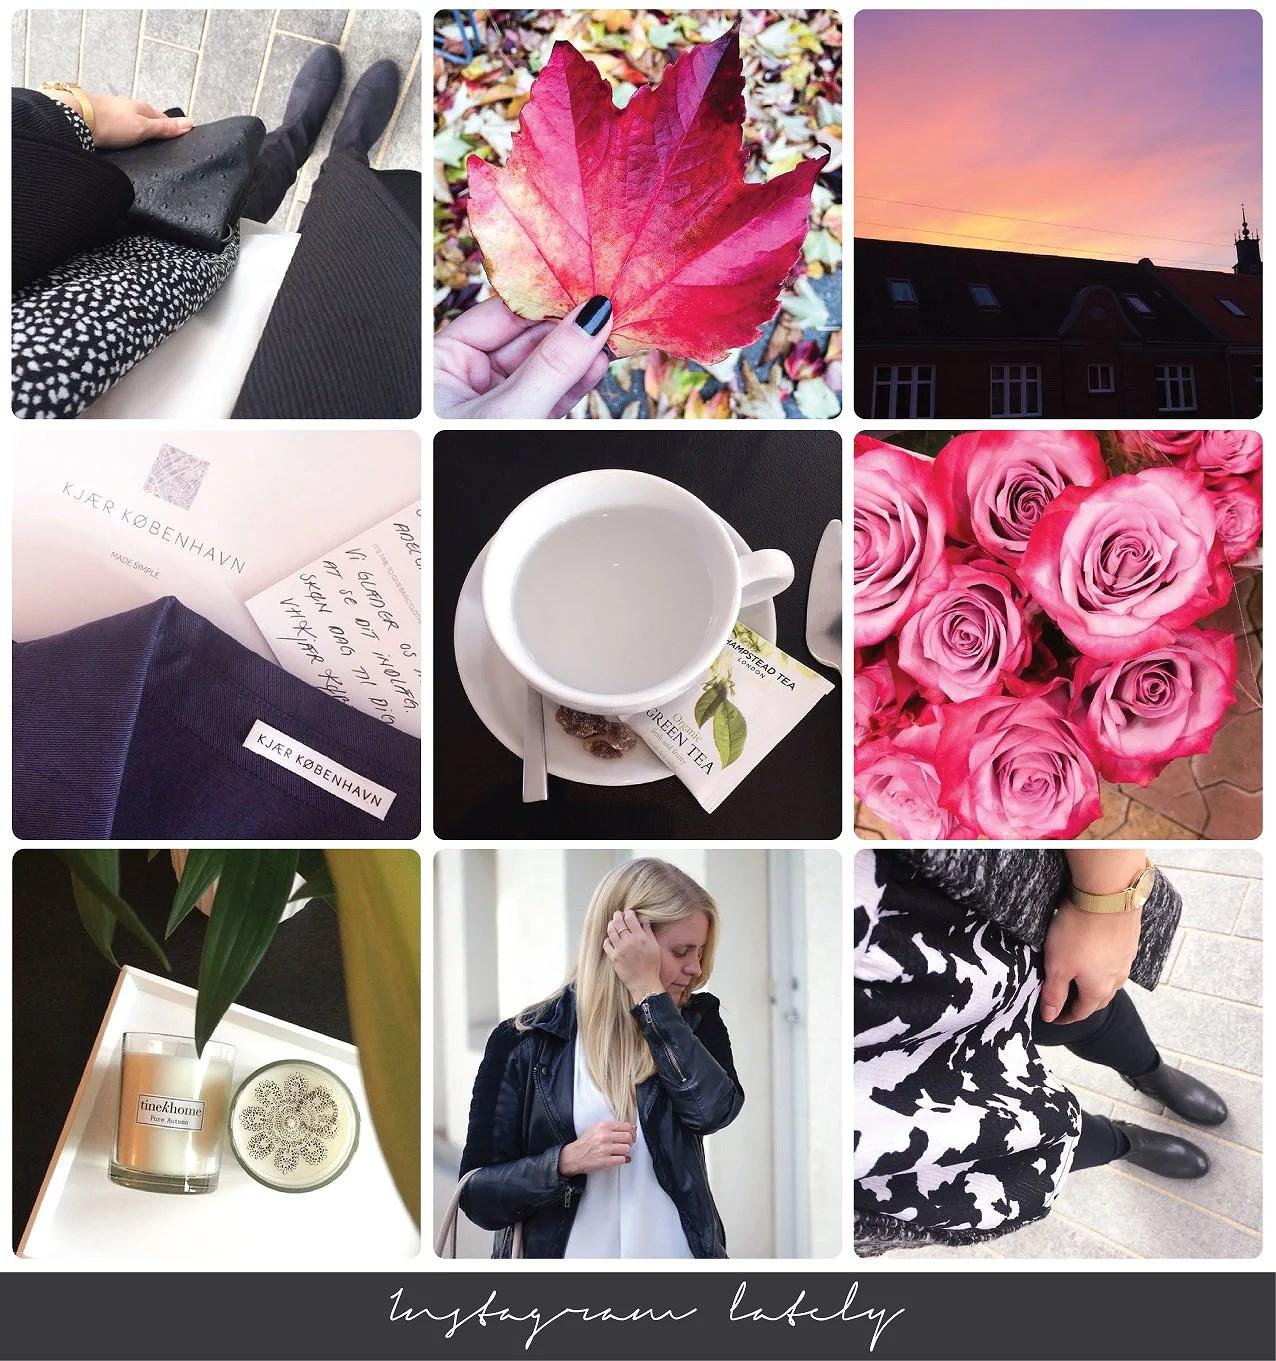 Instagram itsmypassions, modeblogger